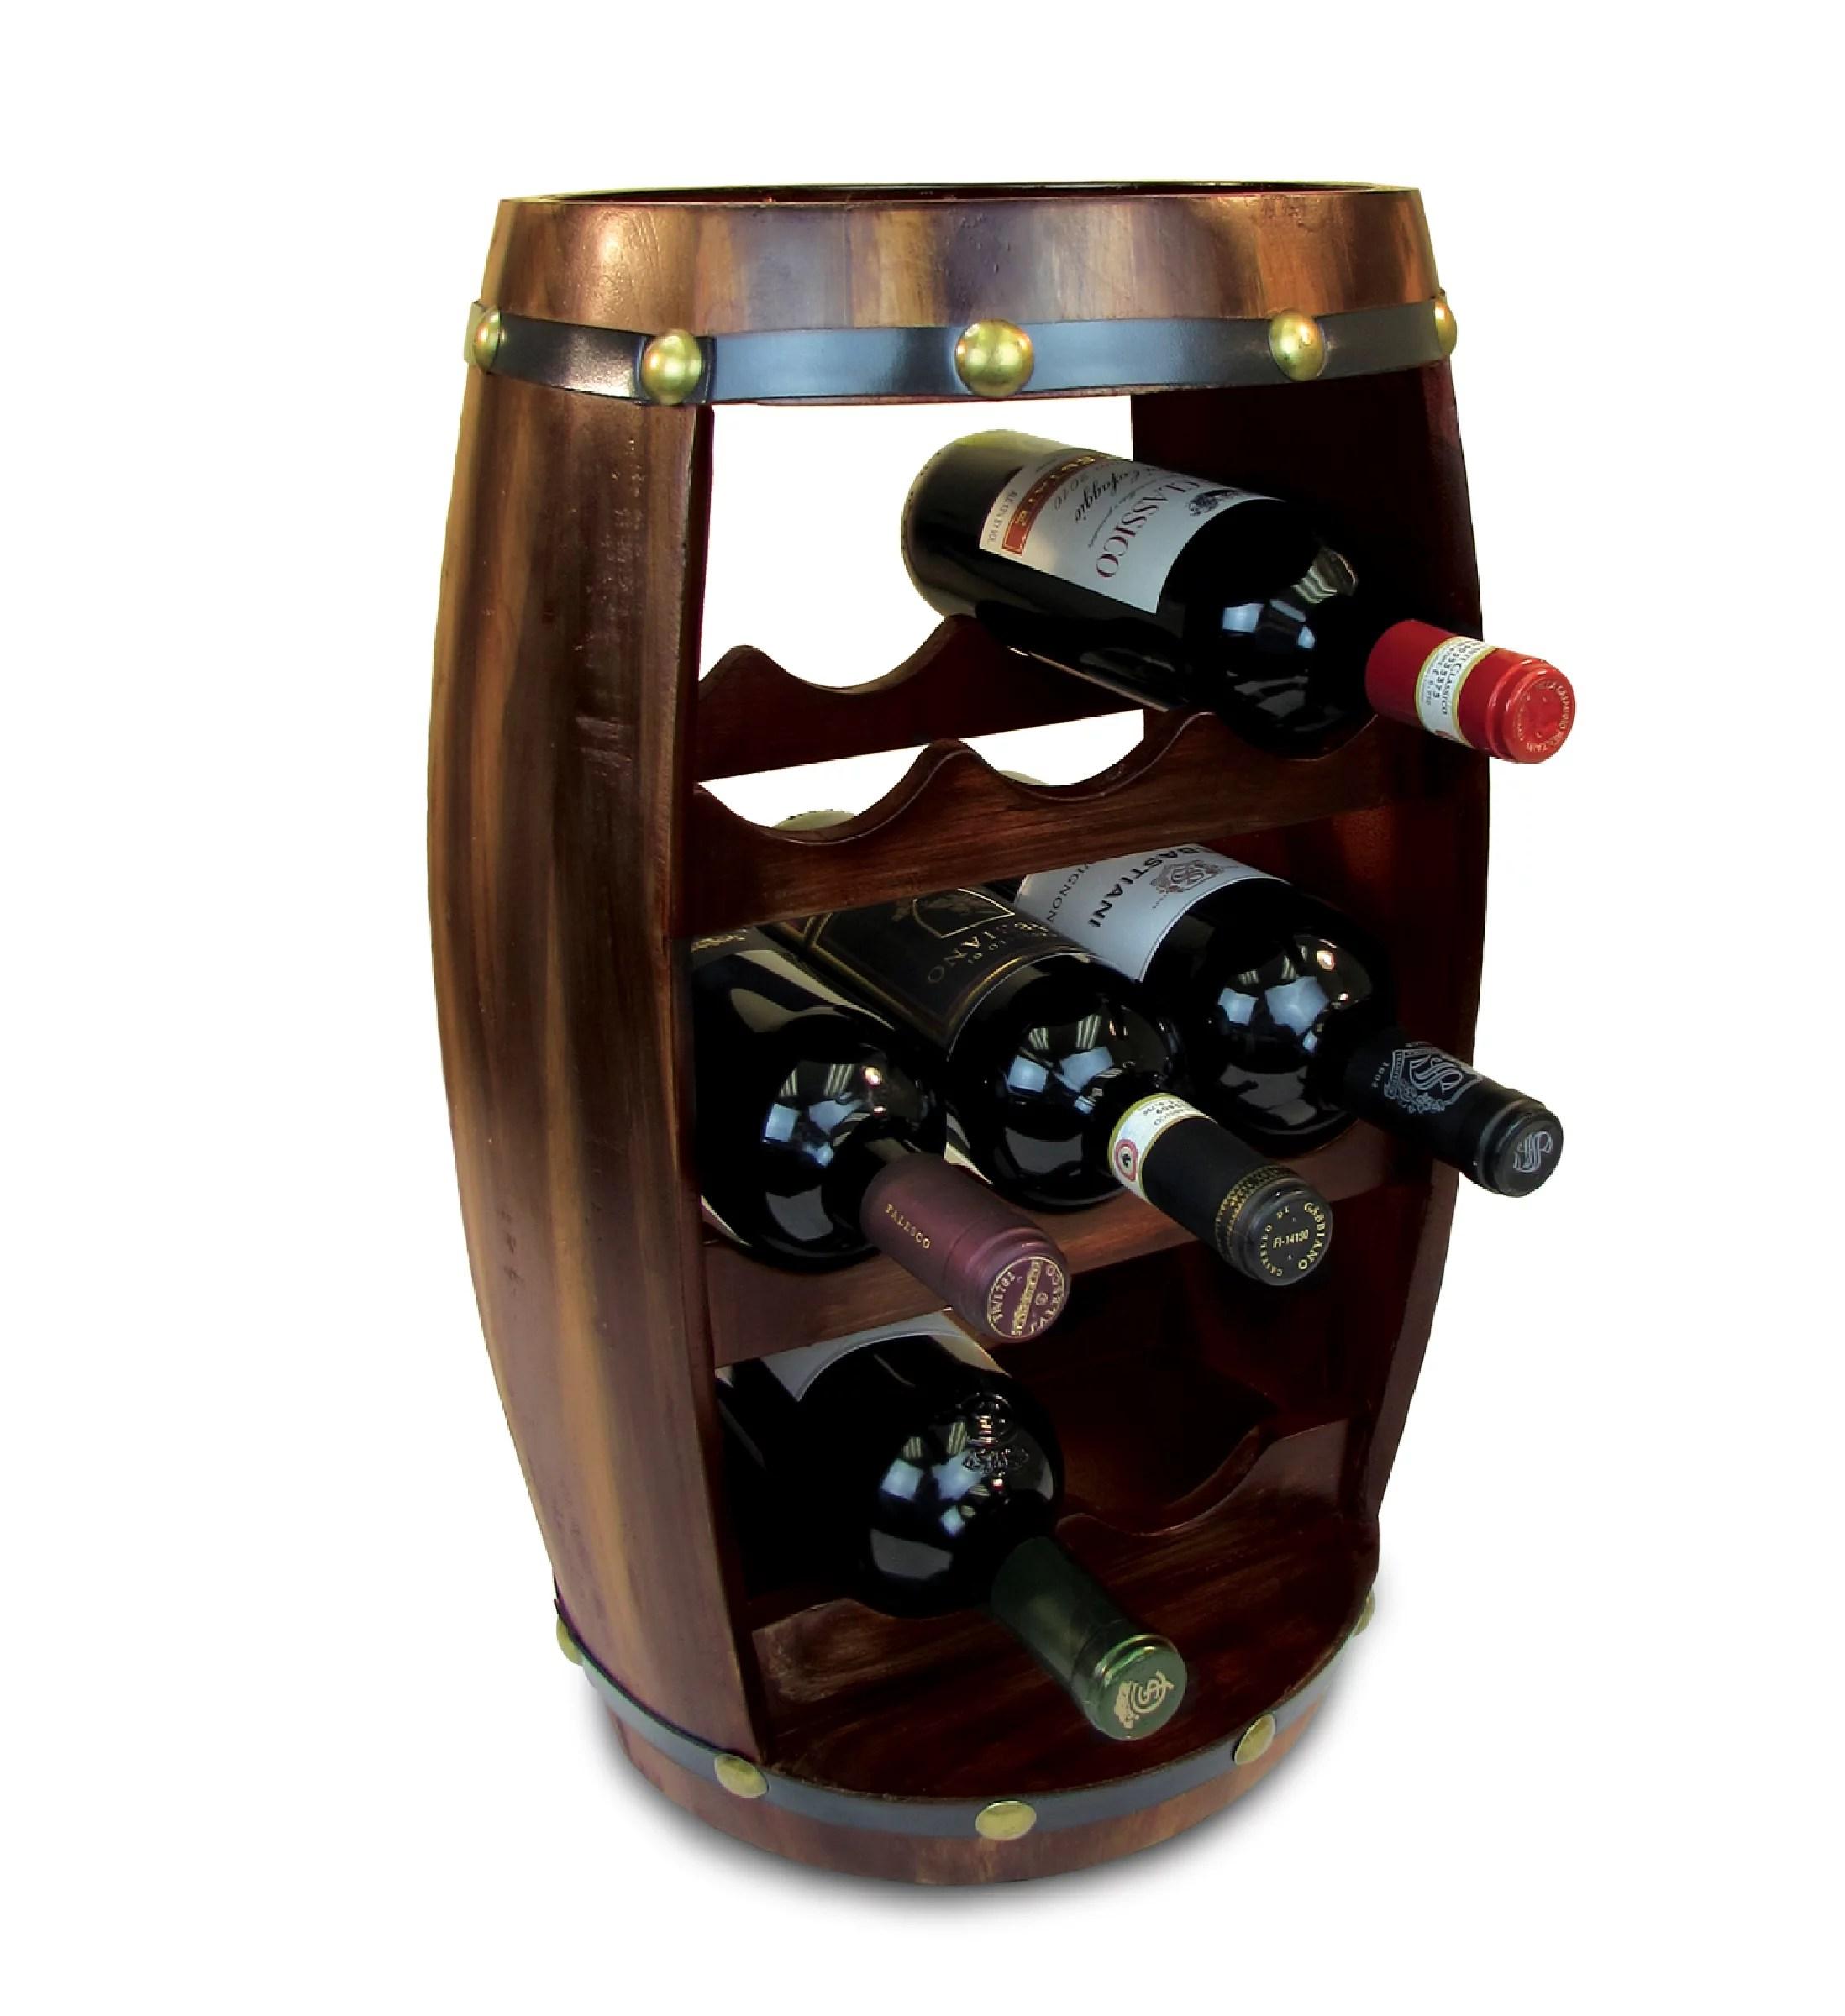 puzzled alexander wine rack 8 bottle free standing wine holder bottle rack floor stand or countertop wine wooden barrel decor storage organizer liquor